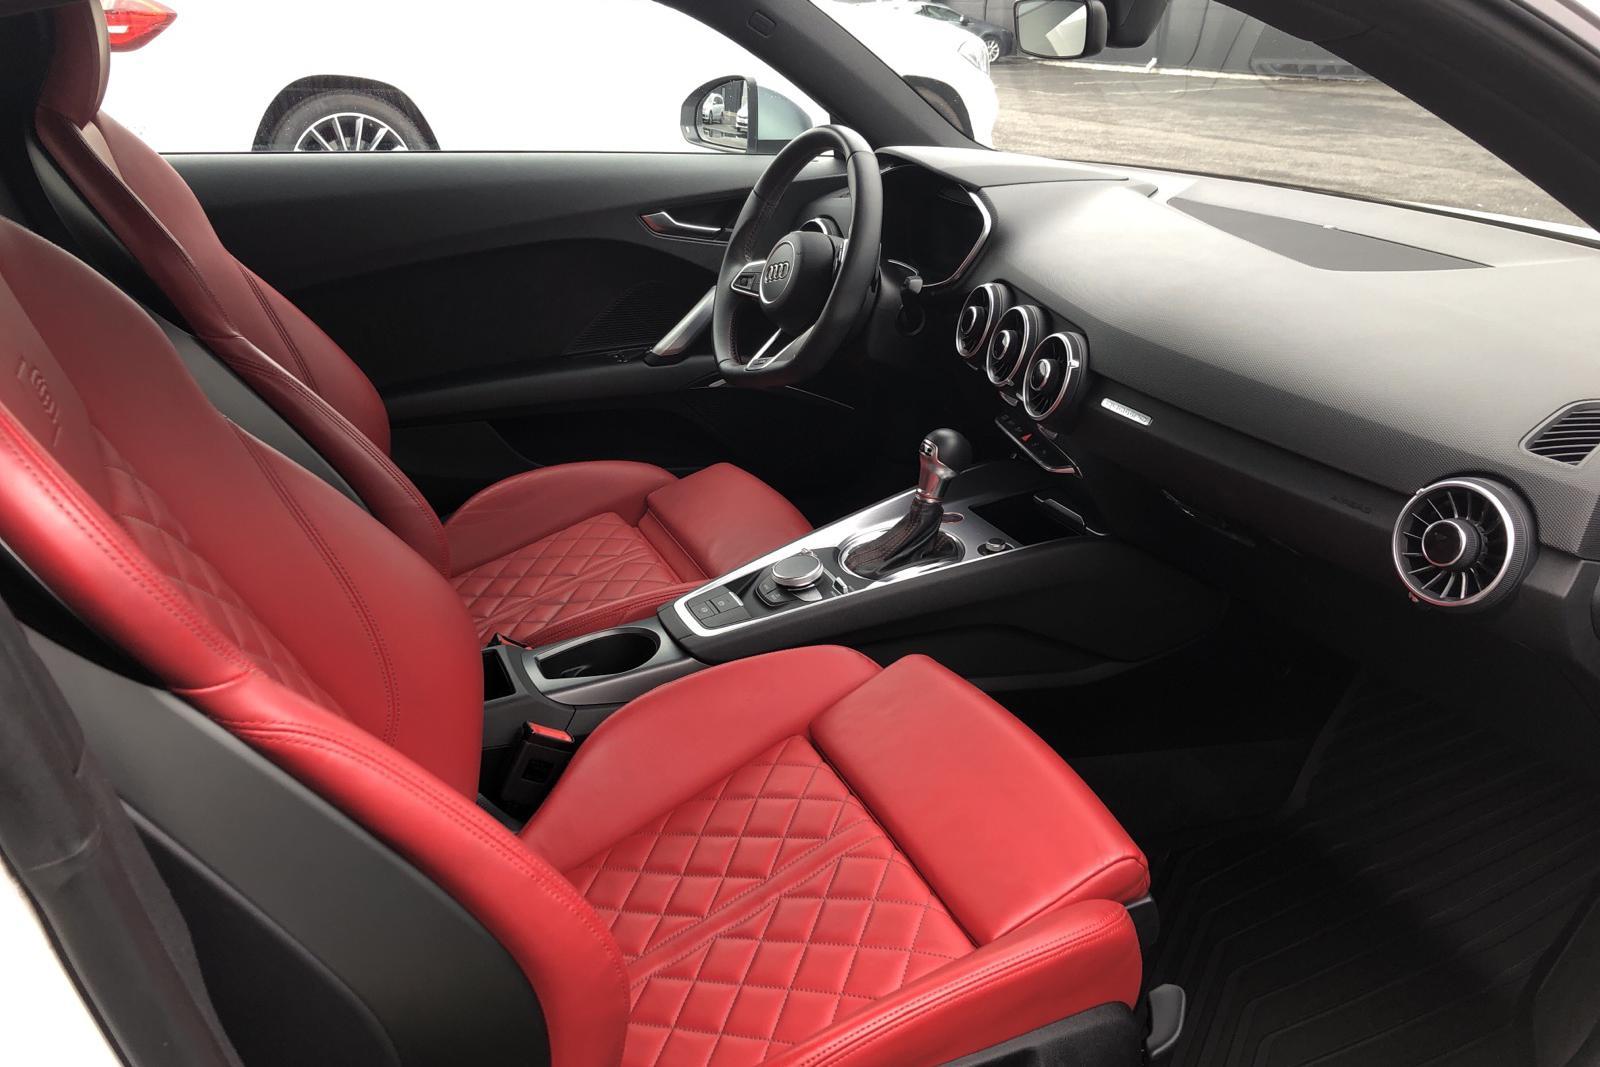 Audi TT S 2.0 TFSI Coupé quattro (310hk) - 57 200 km - Automatic - white - 2018